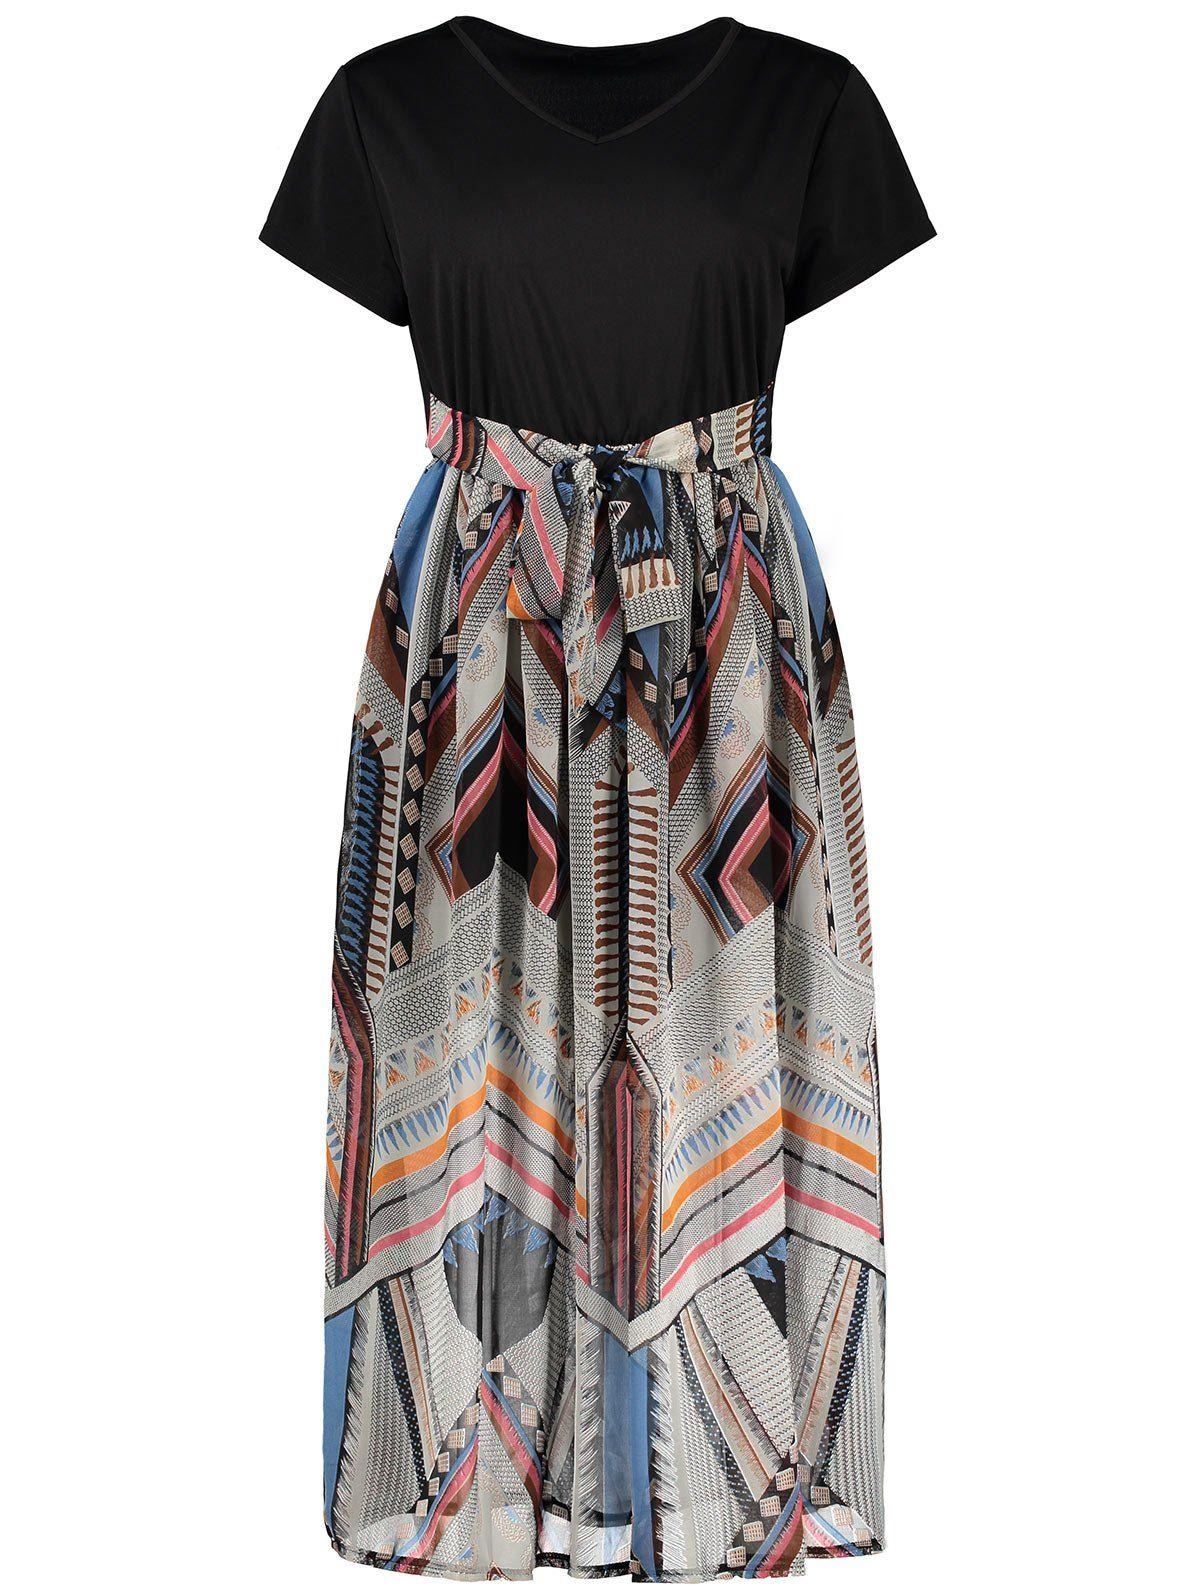 Dressesprom dressblack dresssummer dressesdresses casualdresses